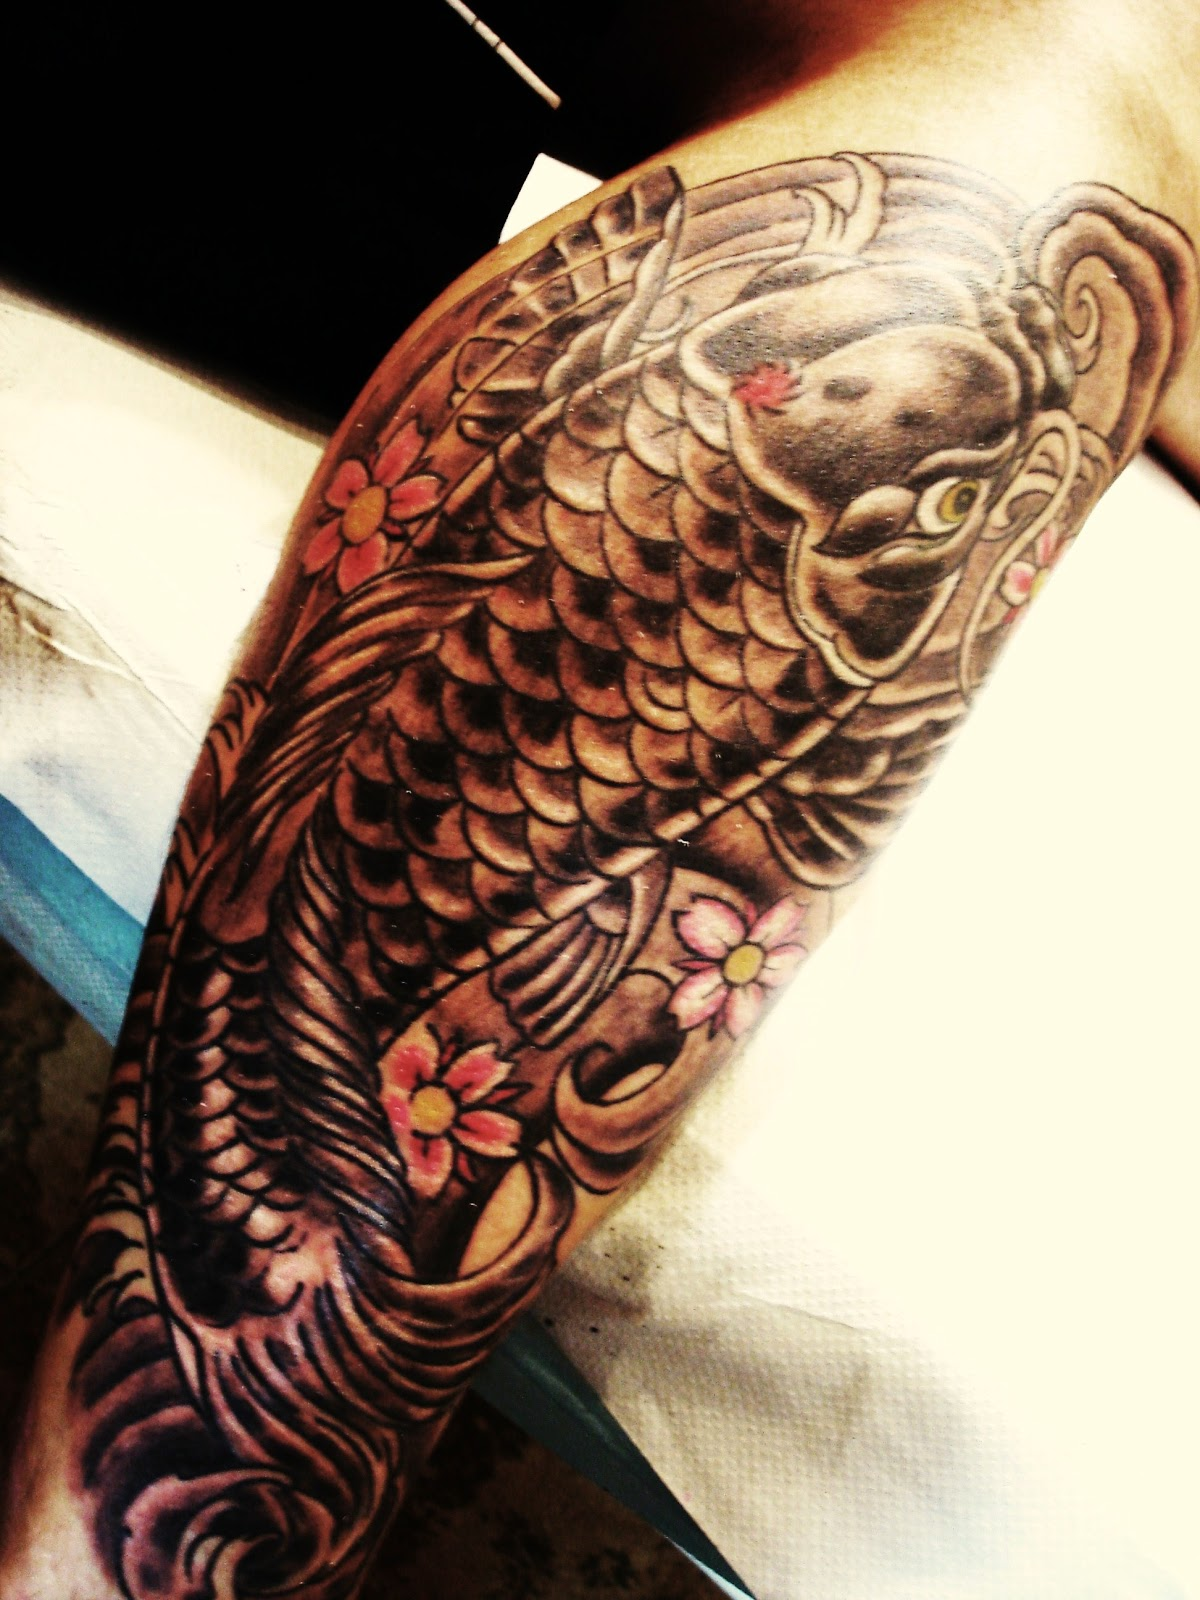 Toop Tattoo Carpa Japonesa Tattoo Alicante Tatuaje